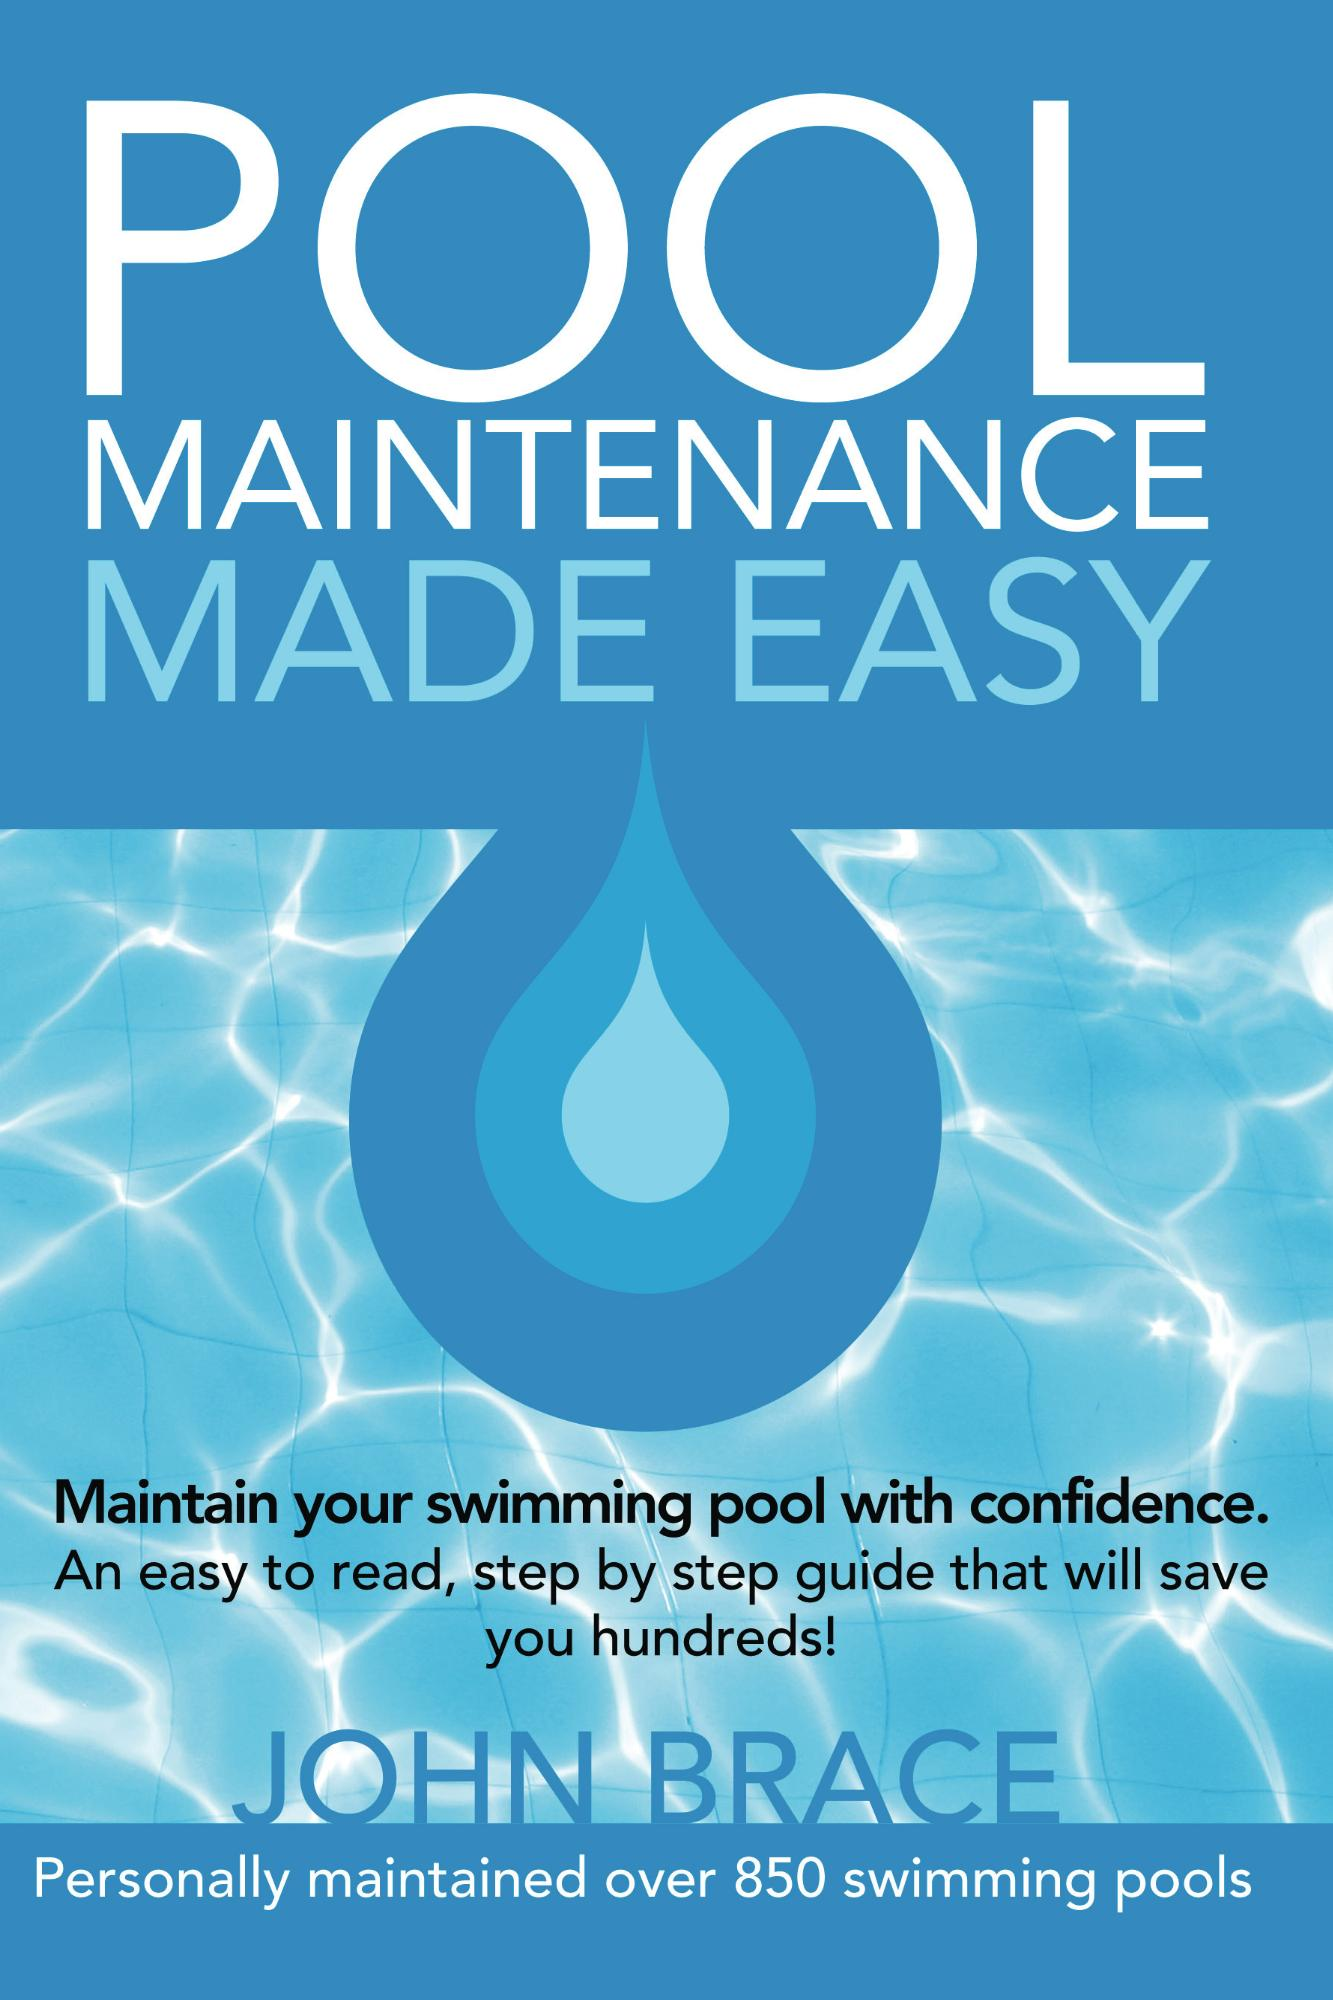 Pool Maintenance Made Easy, an Ebook by John Brace